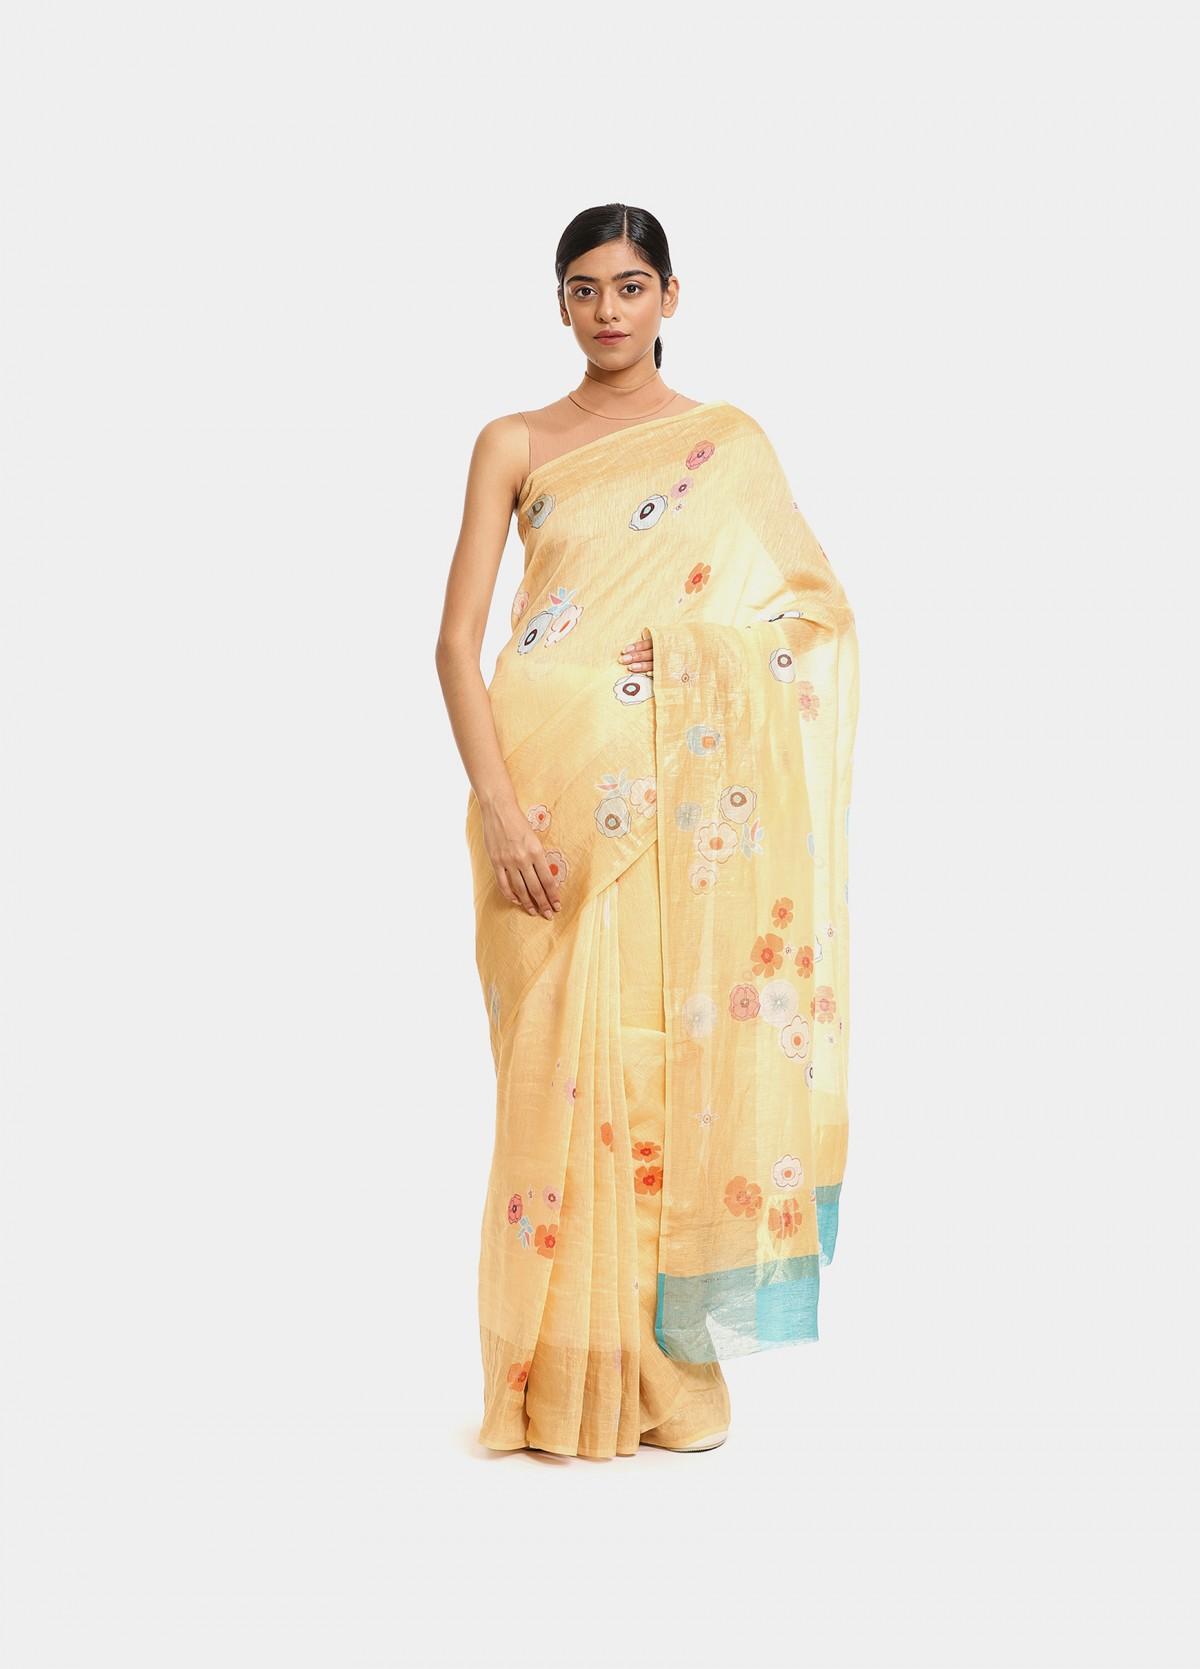 The Gul Bagh Collection Sari